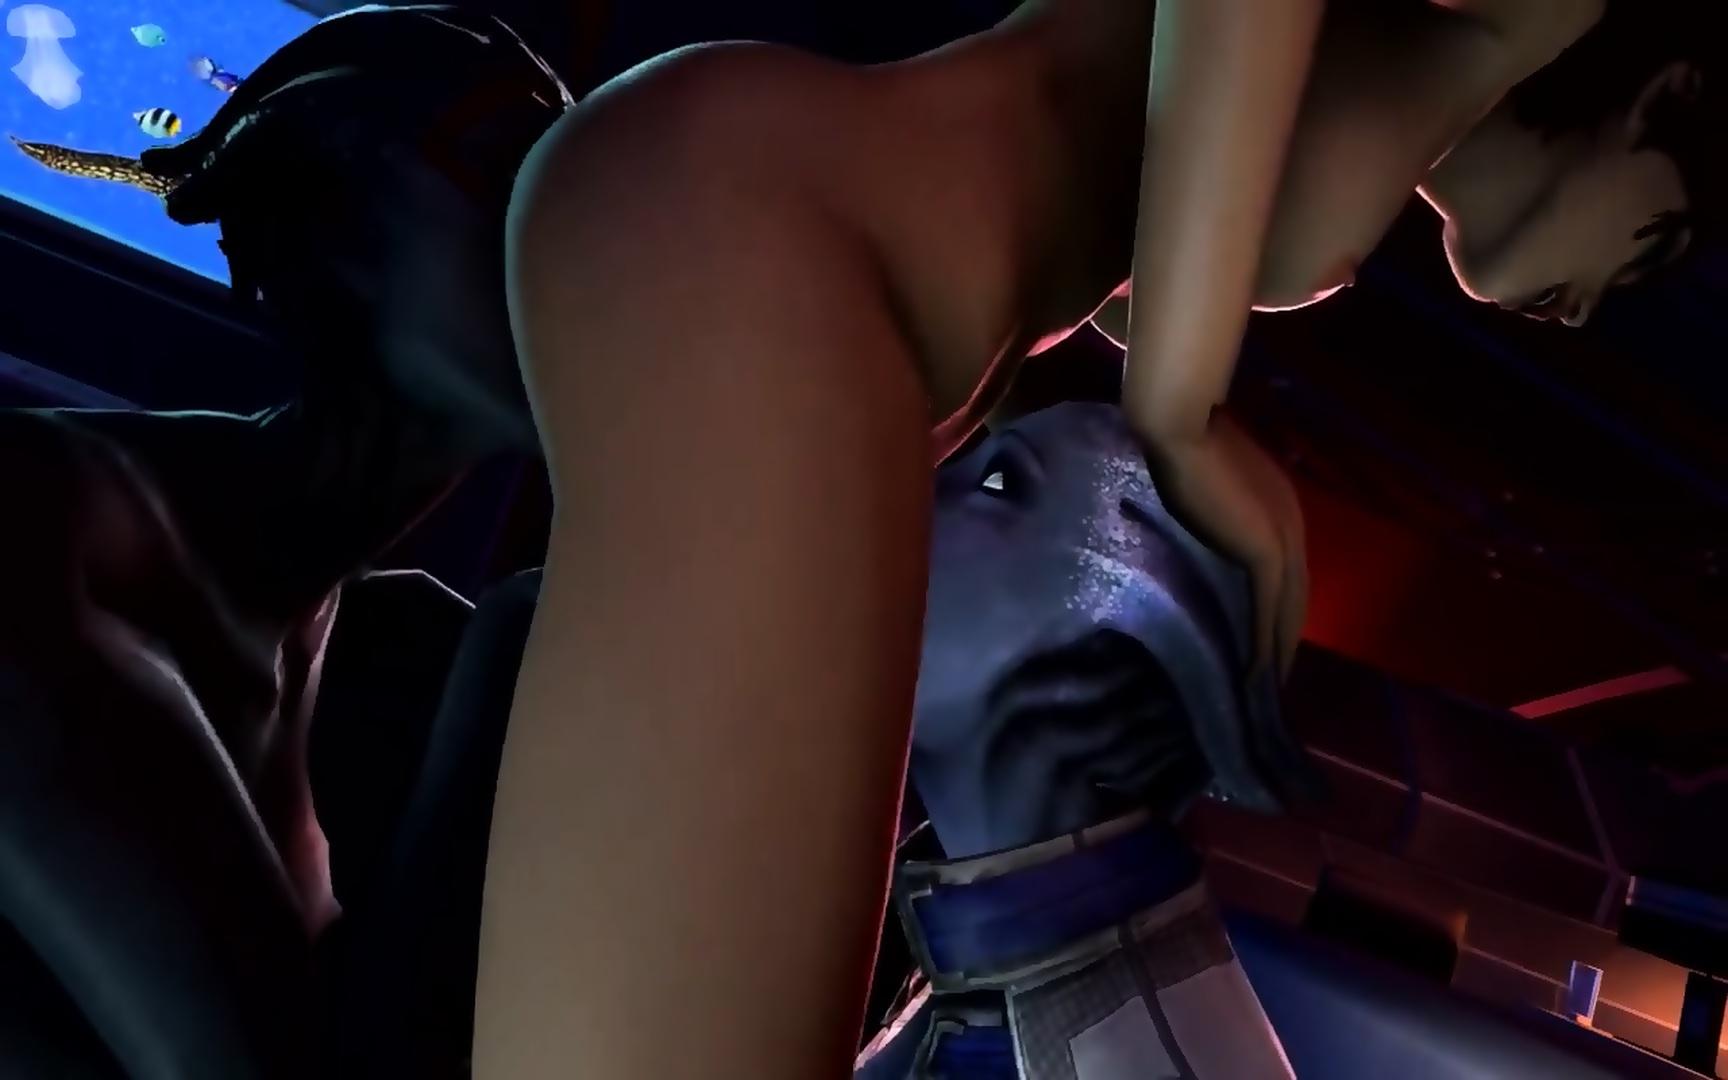 Nikki riot nude